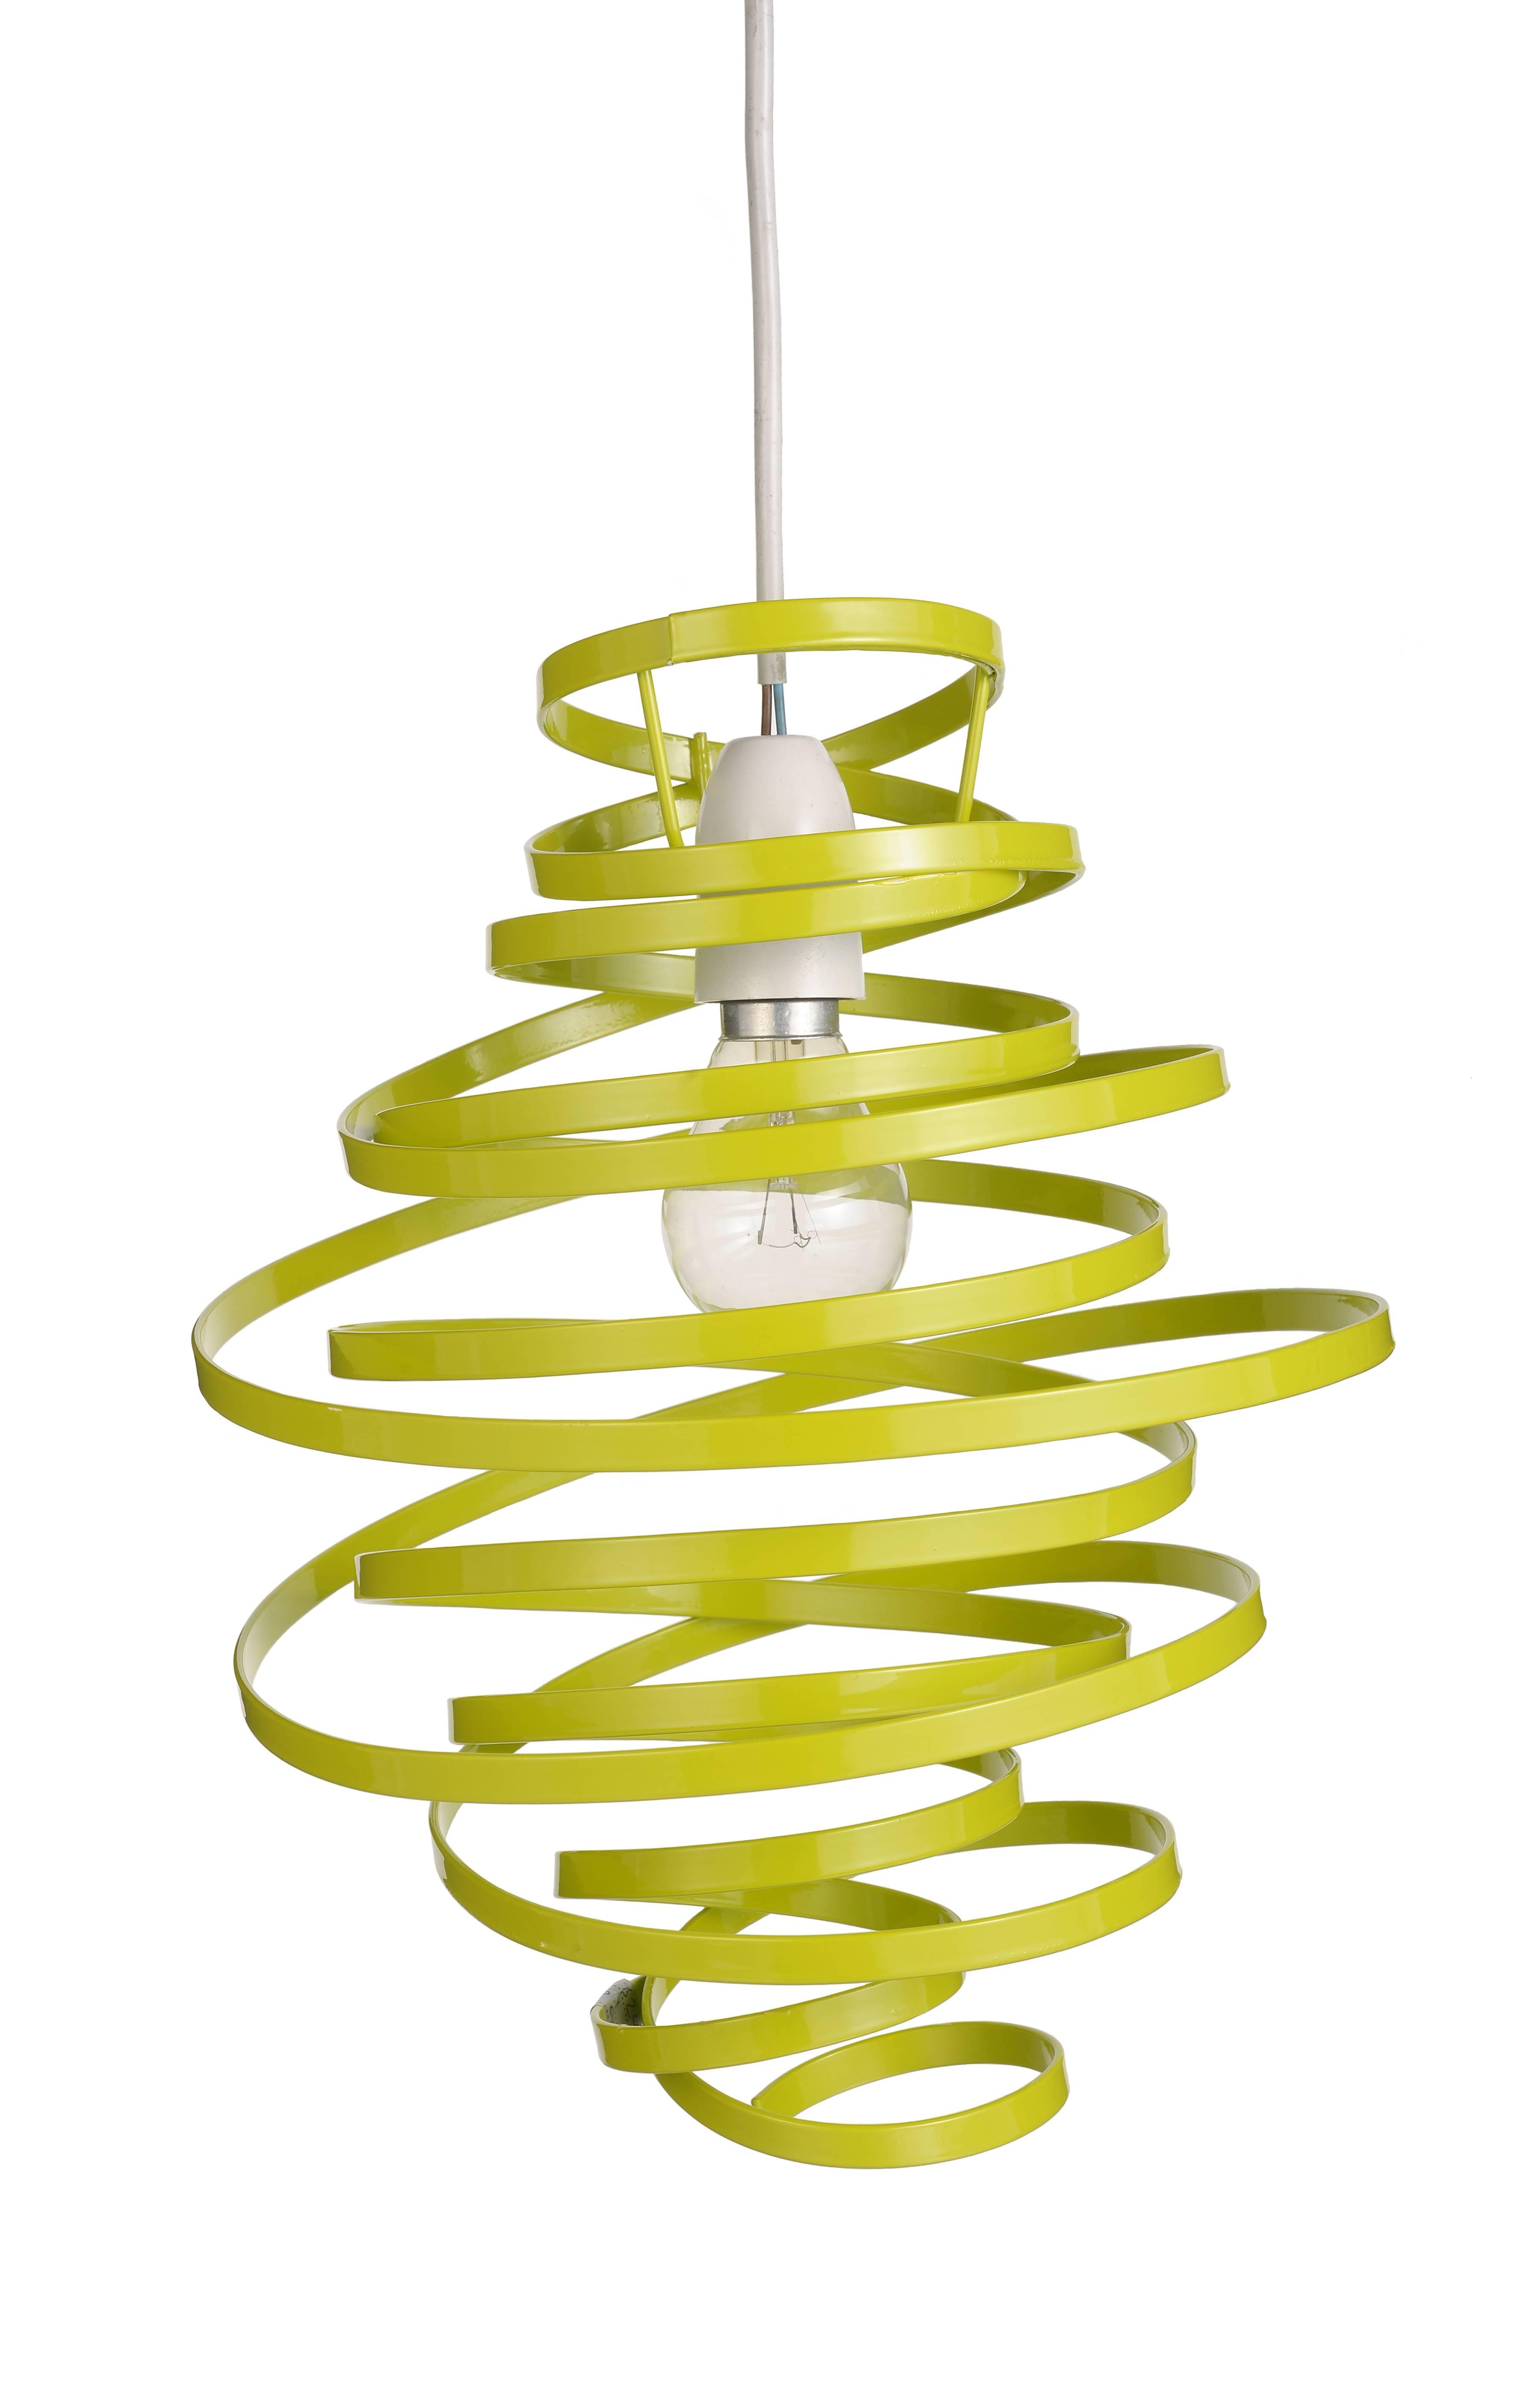 Lights Fantastic - The Treasure Hunter regarding Quirky Pendant Lights (Image 12 of 15)